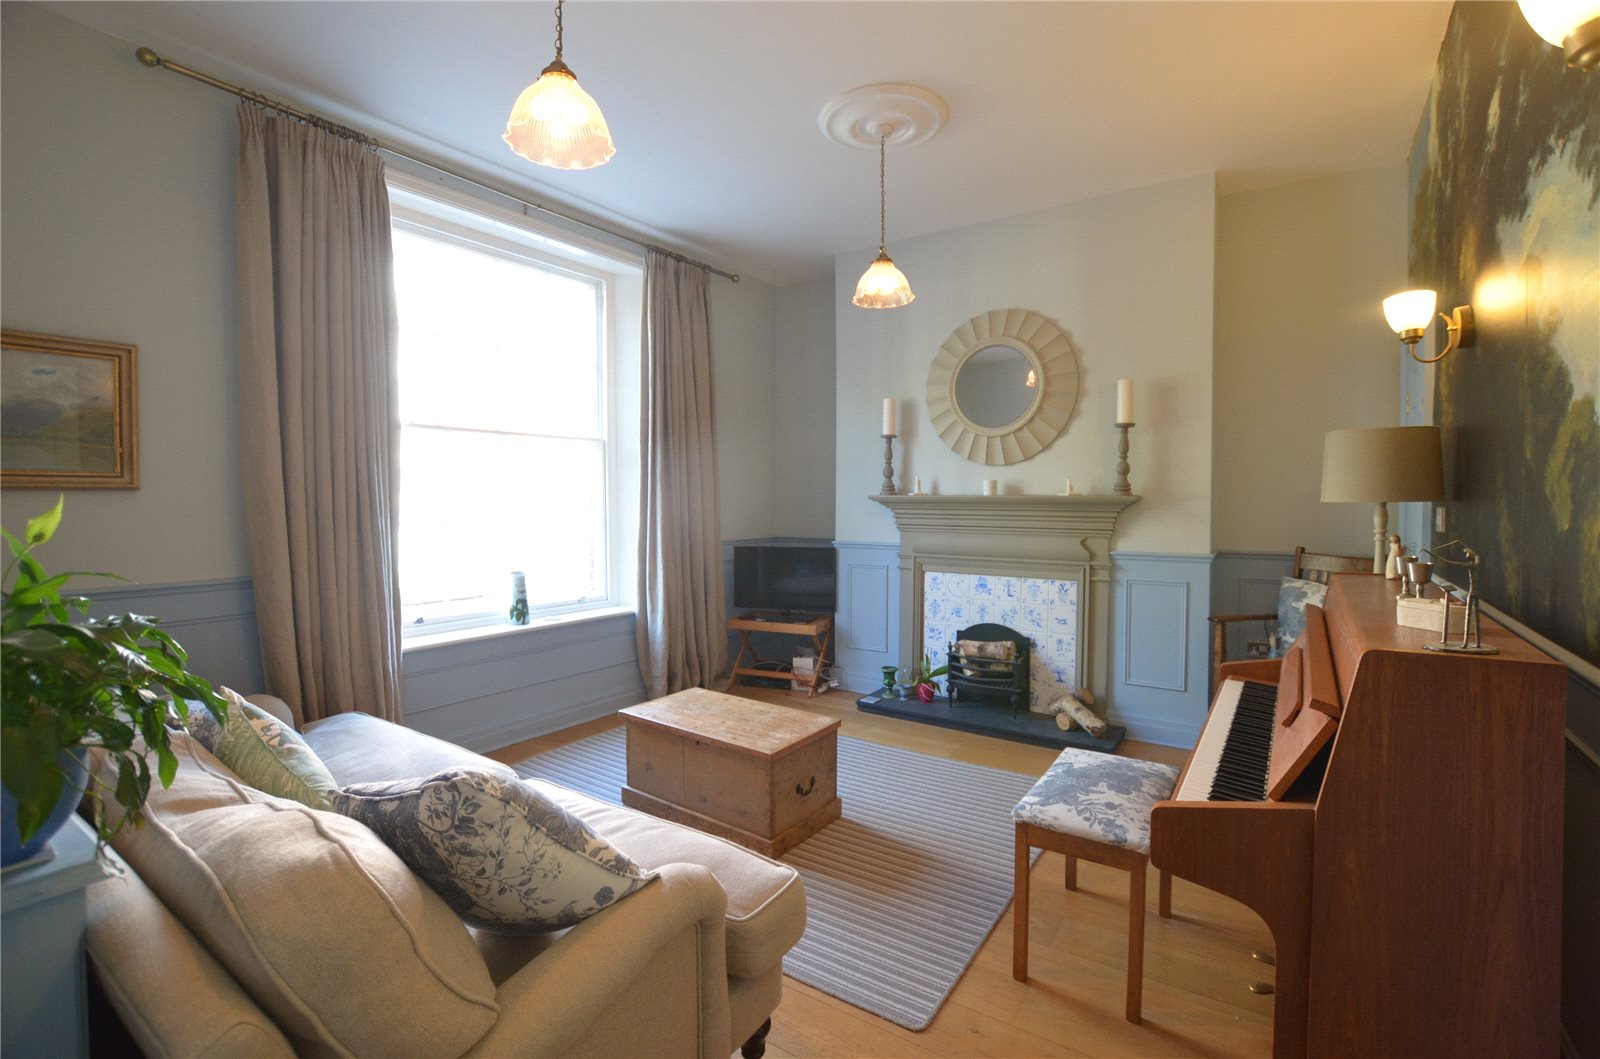 4 Bedrooms House for sale in Falkner Street, Liverpool, Merseyside, L8